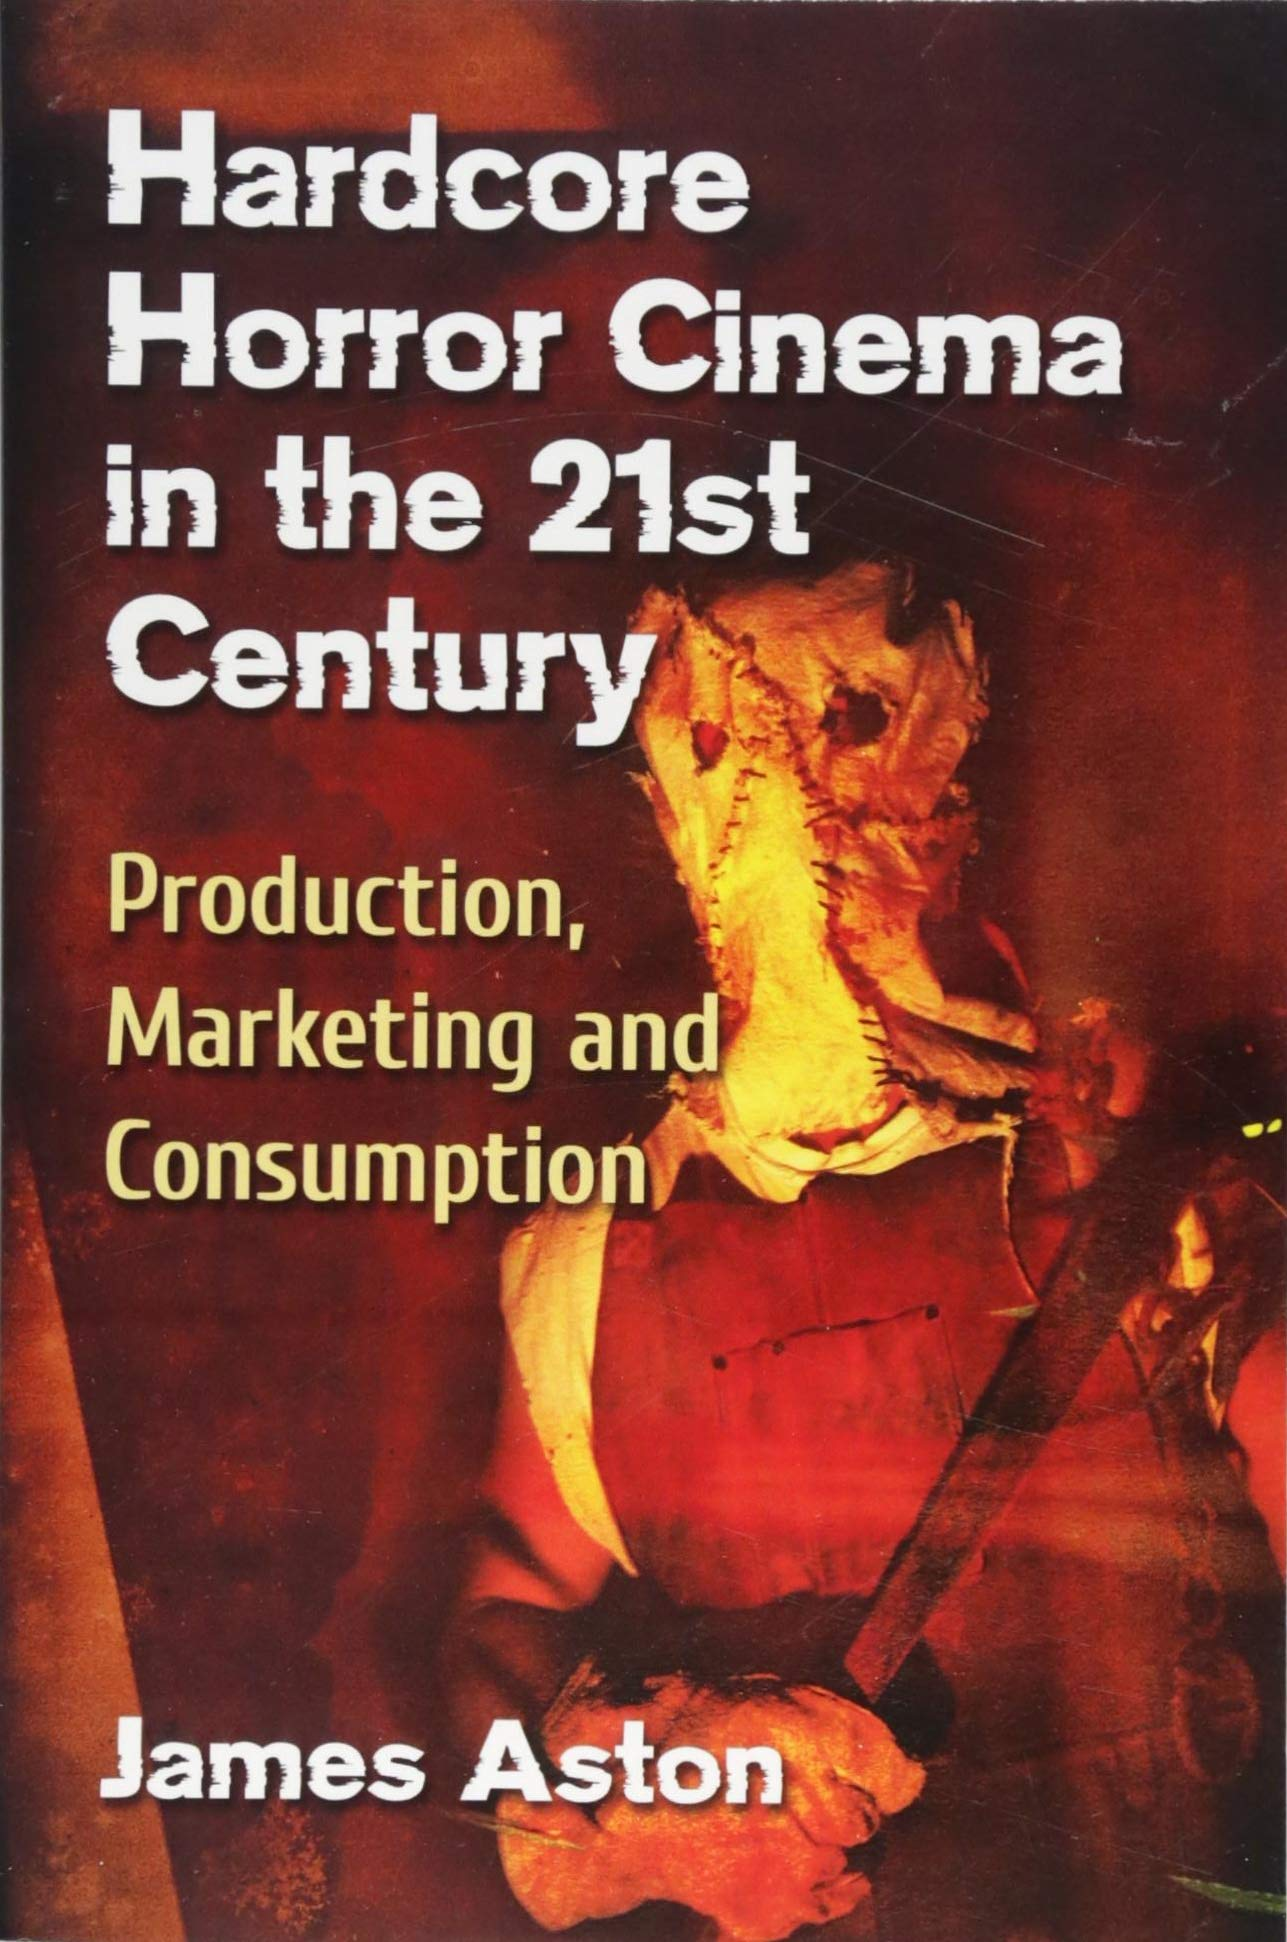 Amazon.com: Hardcore Horror Cinema in the 21st Century: Production,  Marketing and Consumption (9781476668888): James Aston: Books